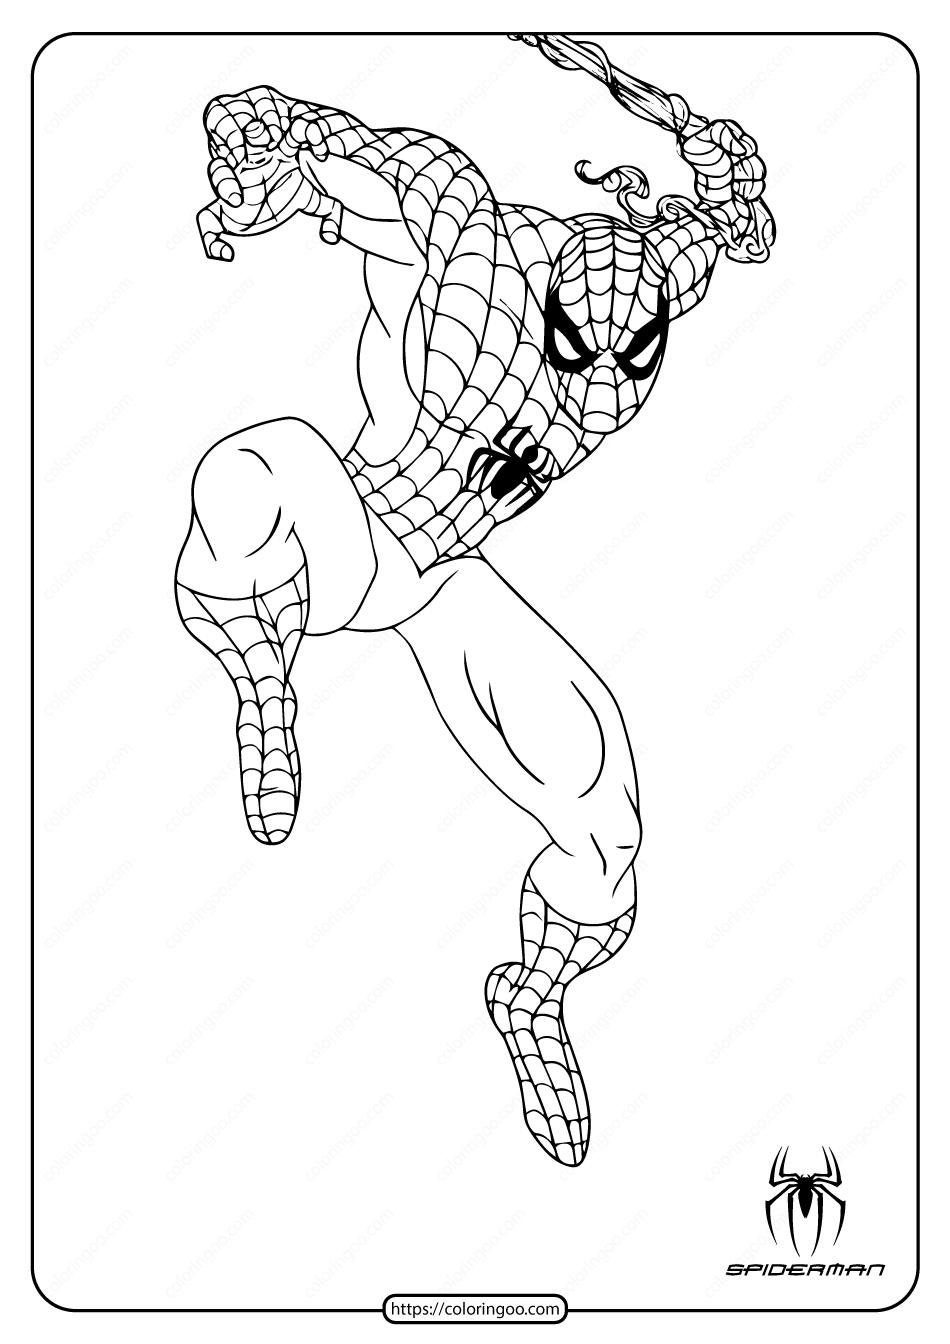 Printable Marvel Spiderman Coloring Page Superhero Coloring Pages Spiderman Coloring Coloring Pages